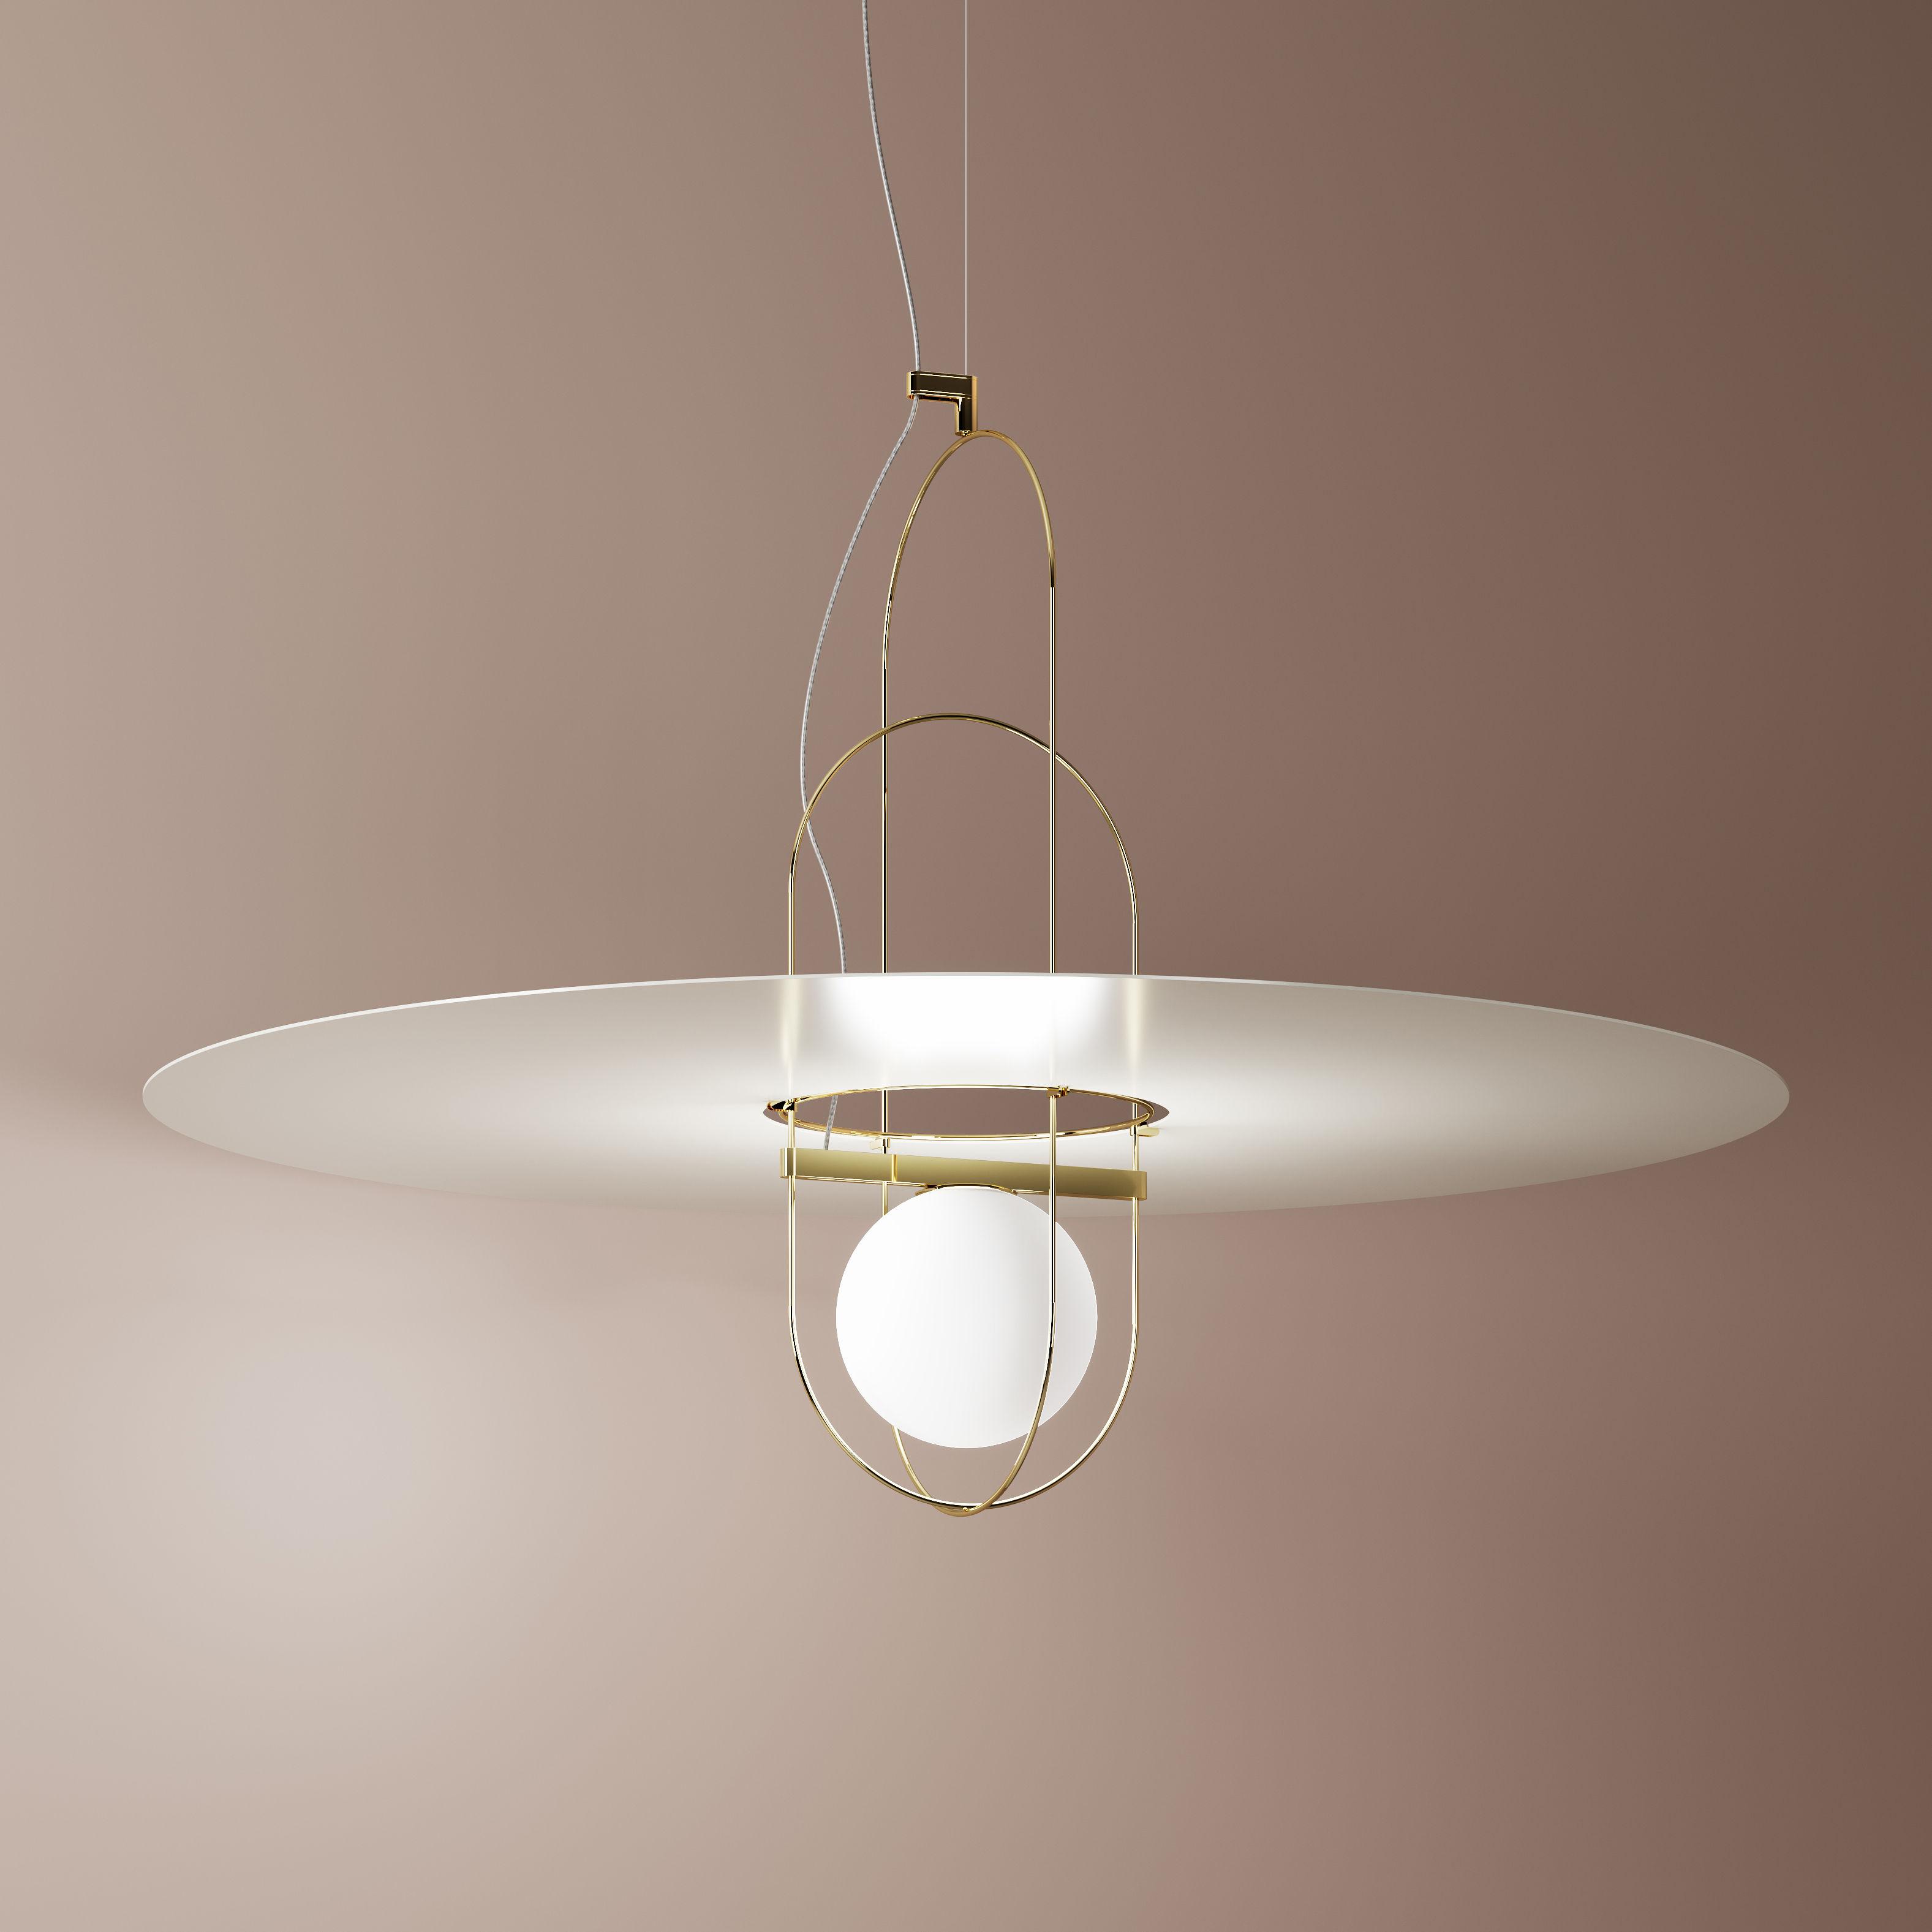 Lighting - Pendant Lighting - Setareh Pendant - / LED - Ø 100 x H 55 cm by Fontana Arte - Gold & white - Metal, Mouth blown glass